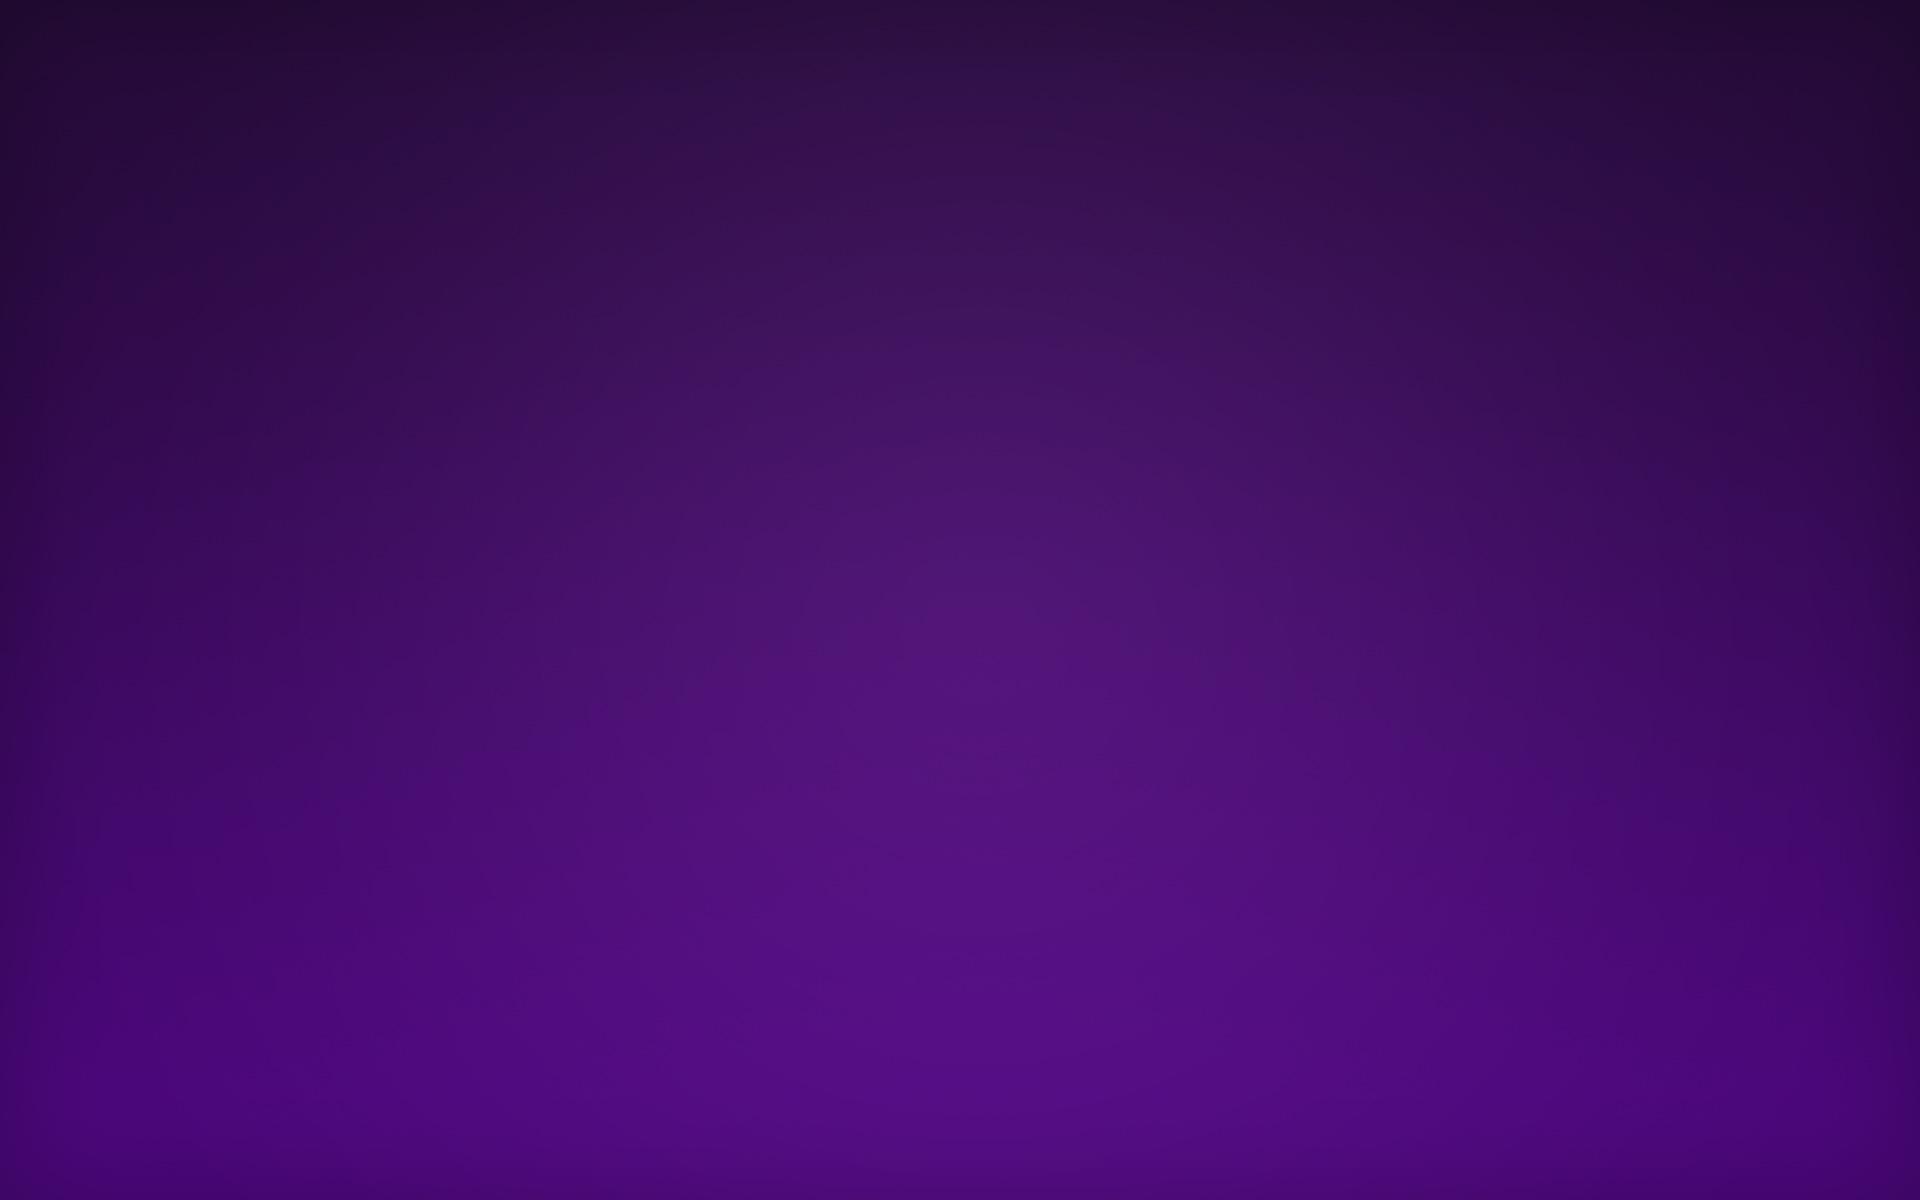 Pics Photos   Purple Tablet Wallpaper Hd 1920x1200